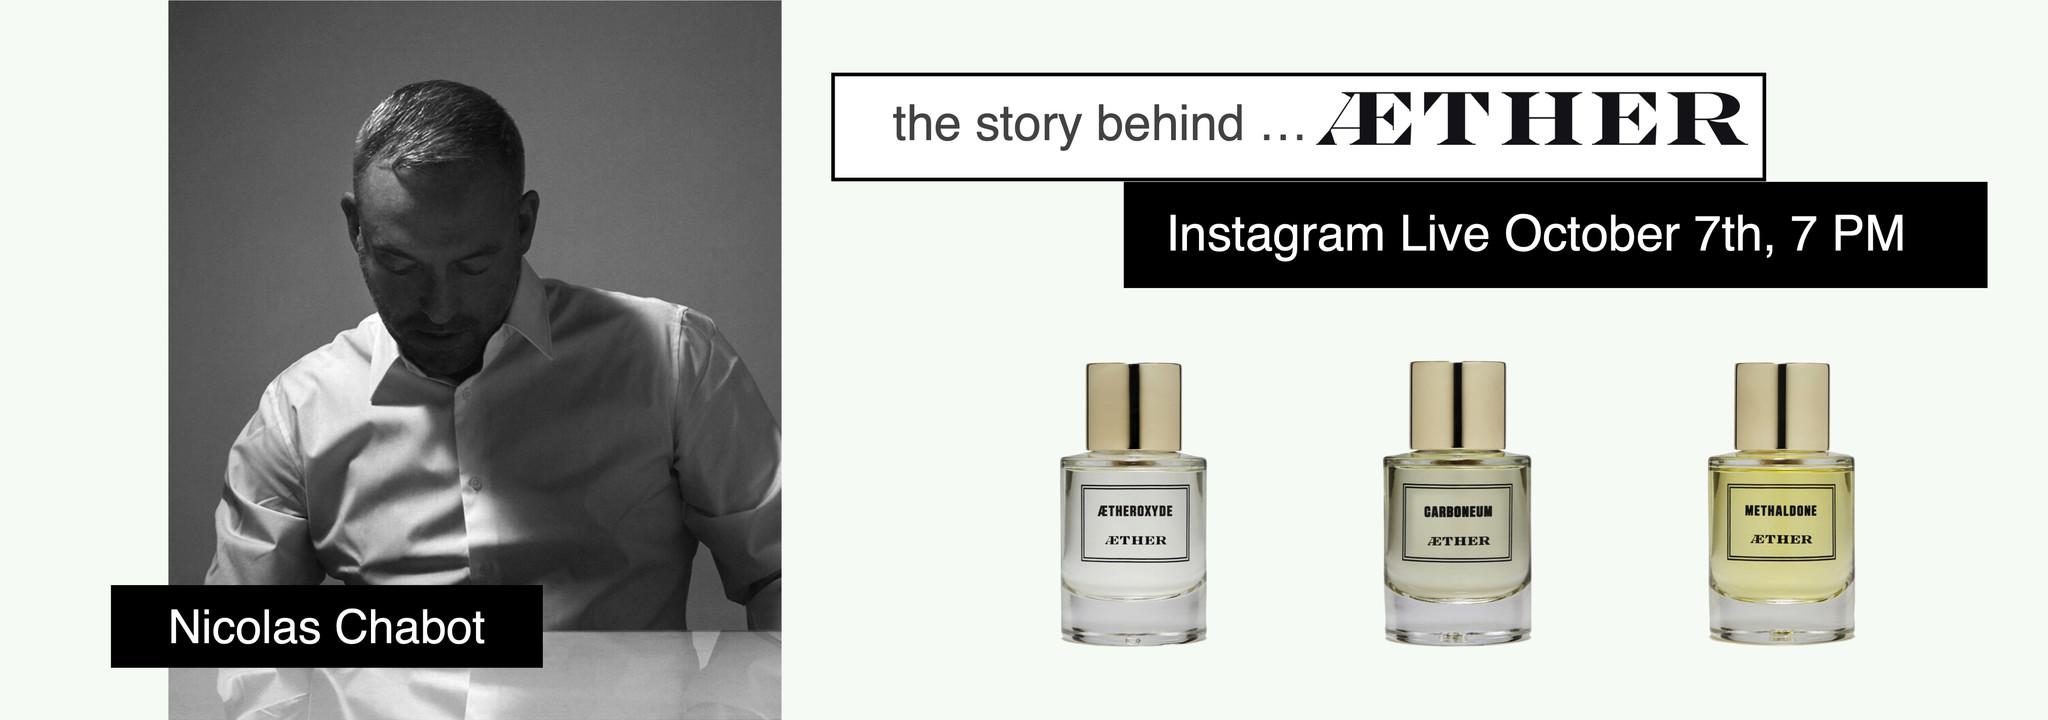 l'histoire derrière ... AETHER